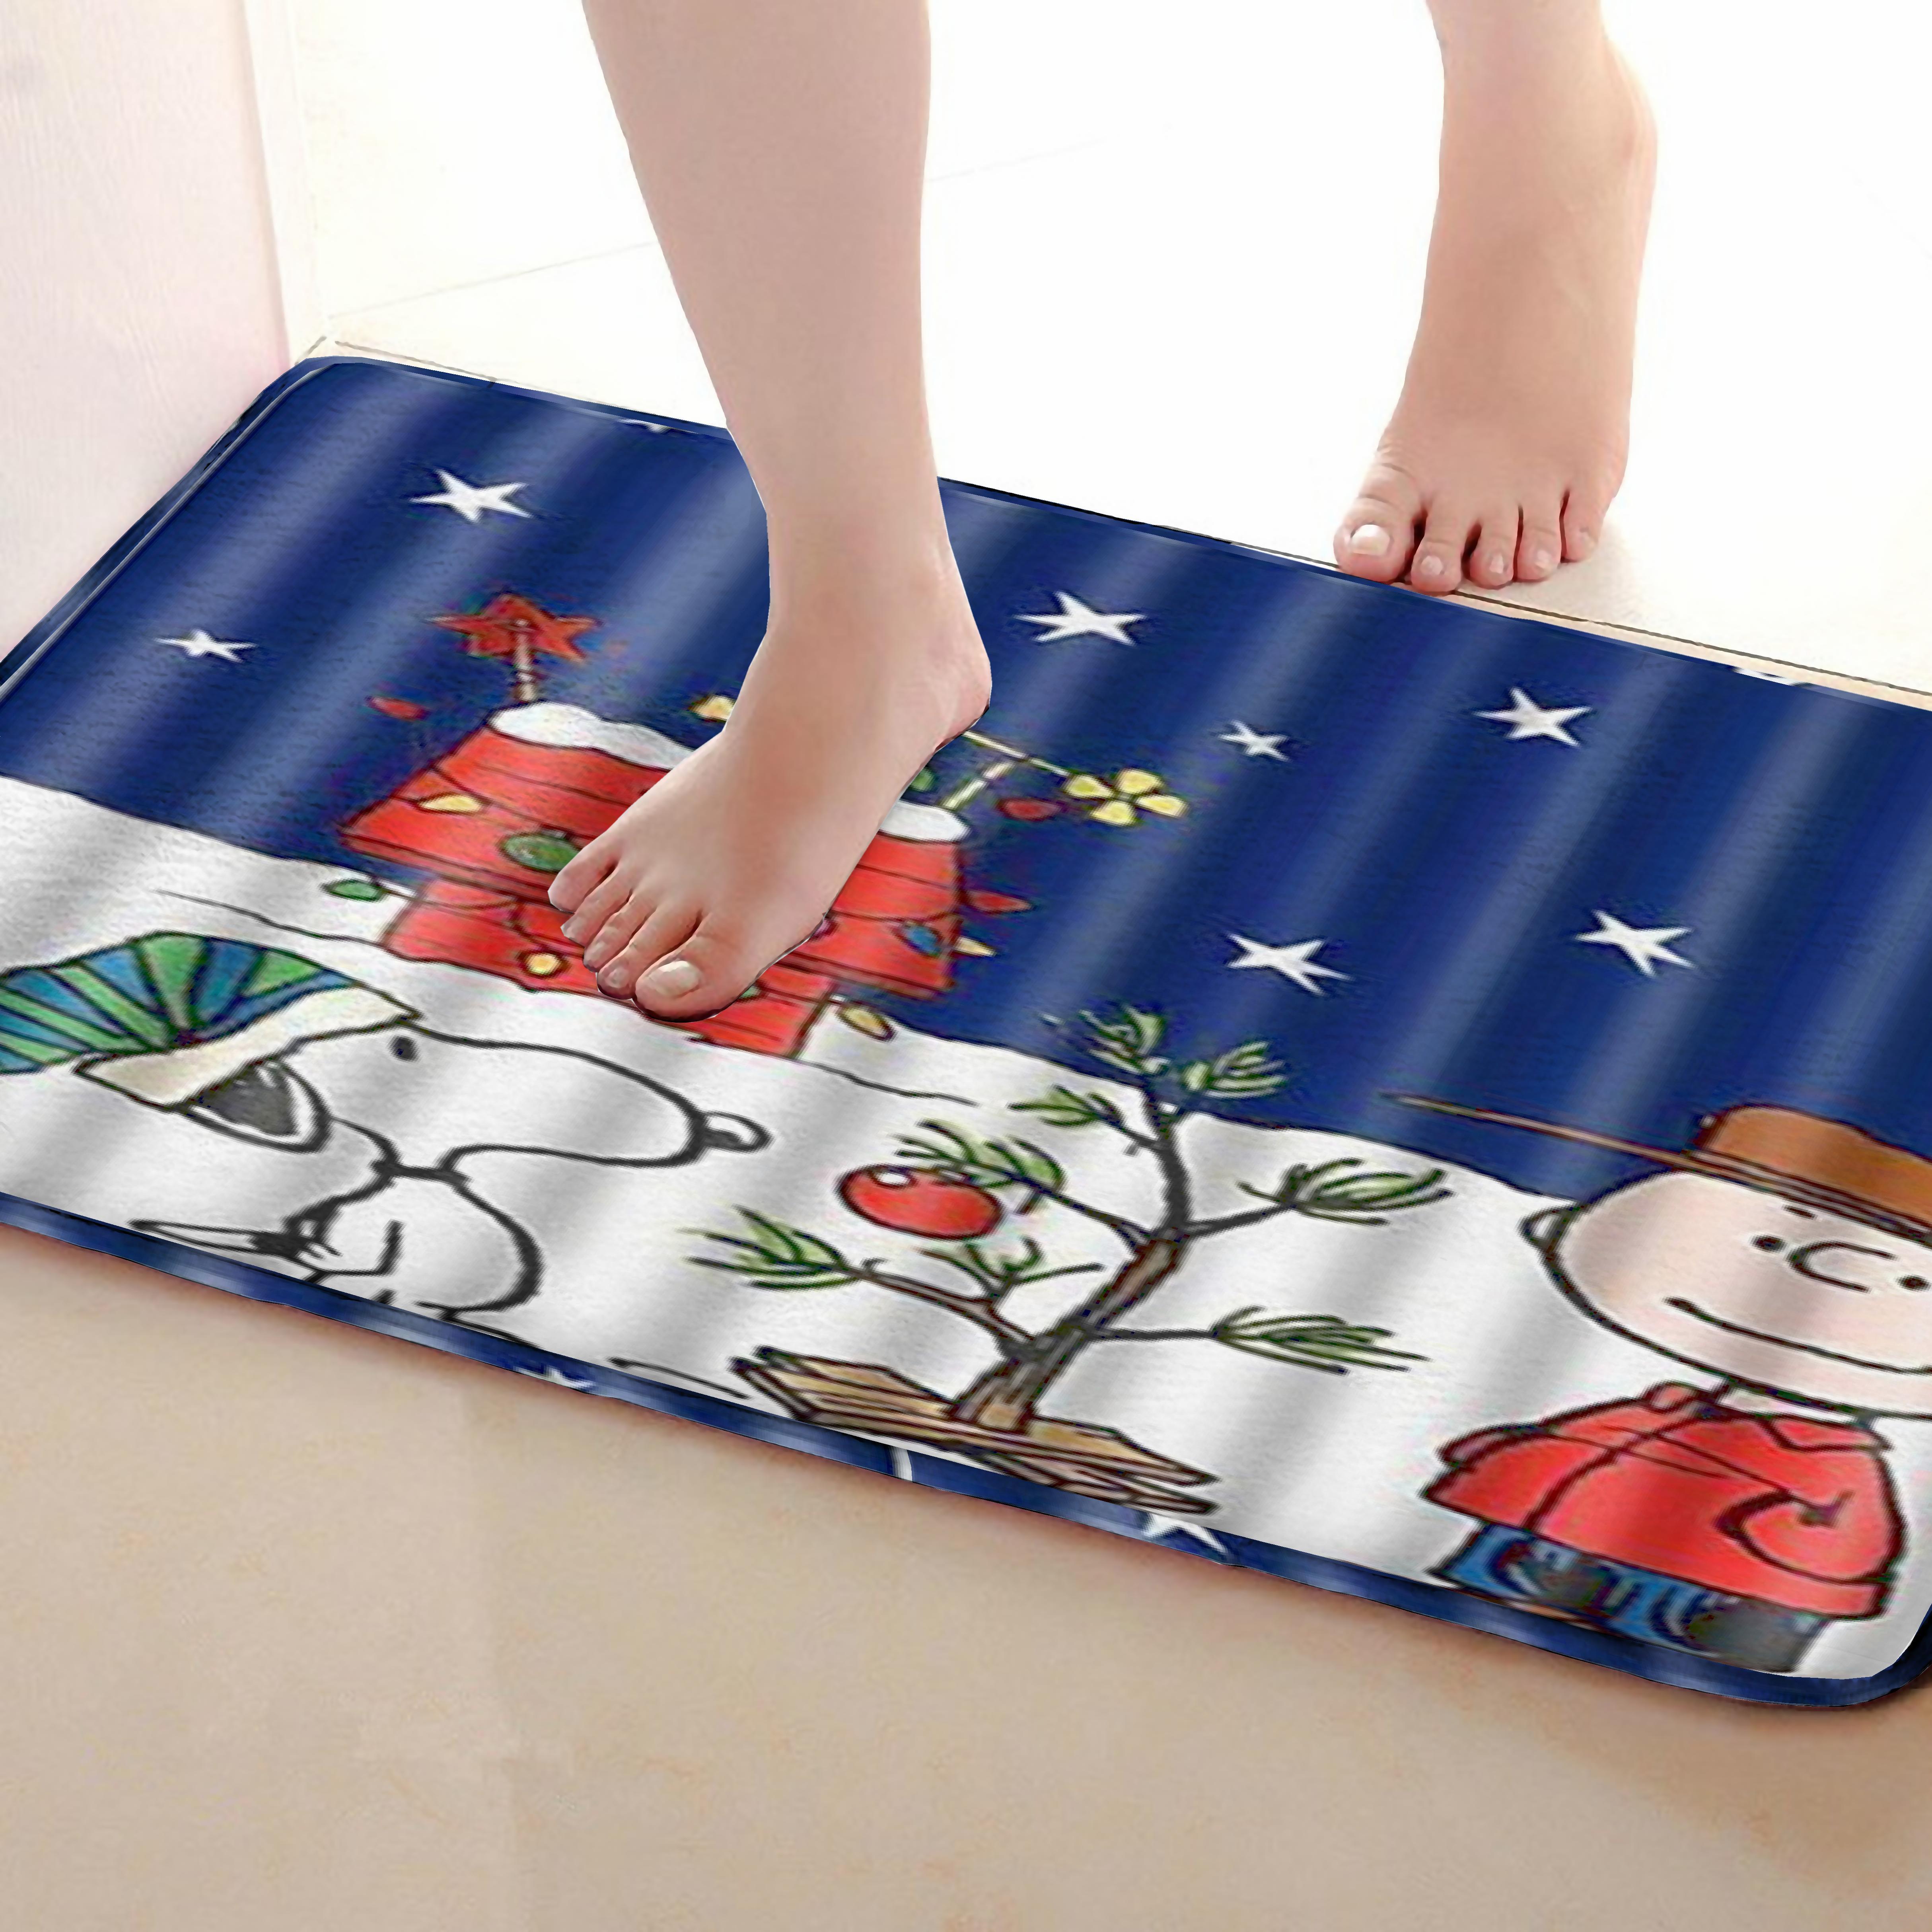 Cartoon Style Bathroom Mat,Funny Anti Skid Bath Mat,Shower Curtains Accessories,Matching Your Shower Curtain